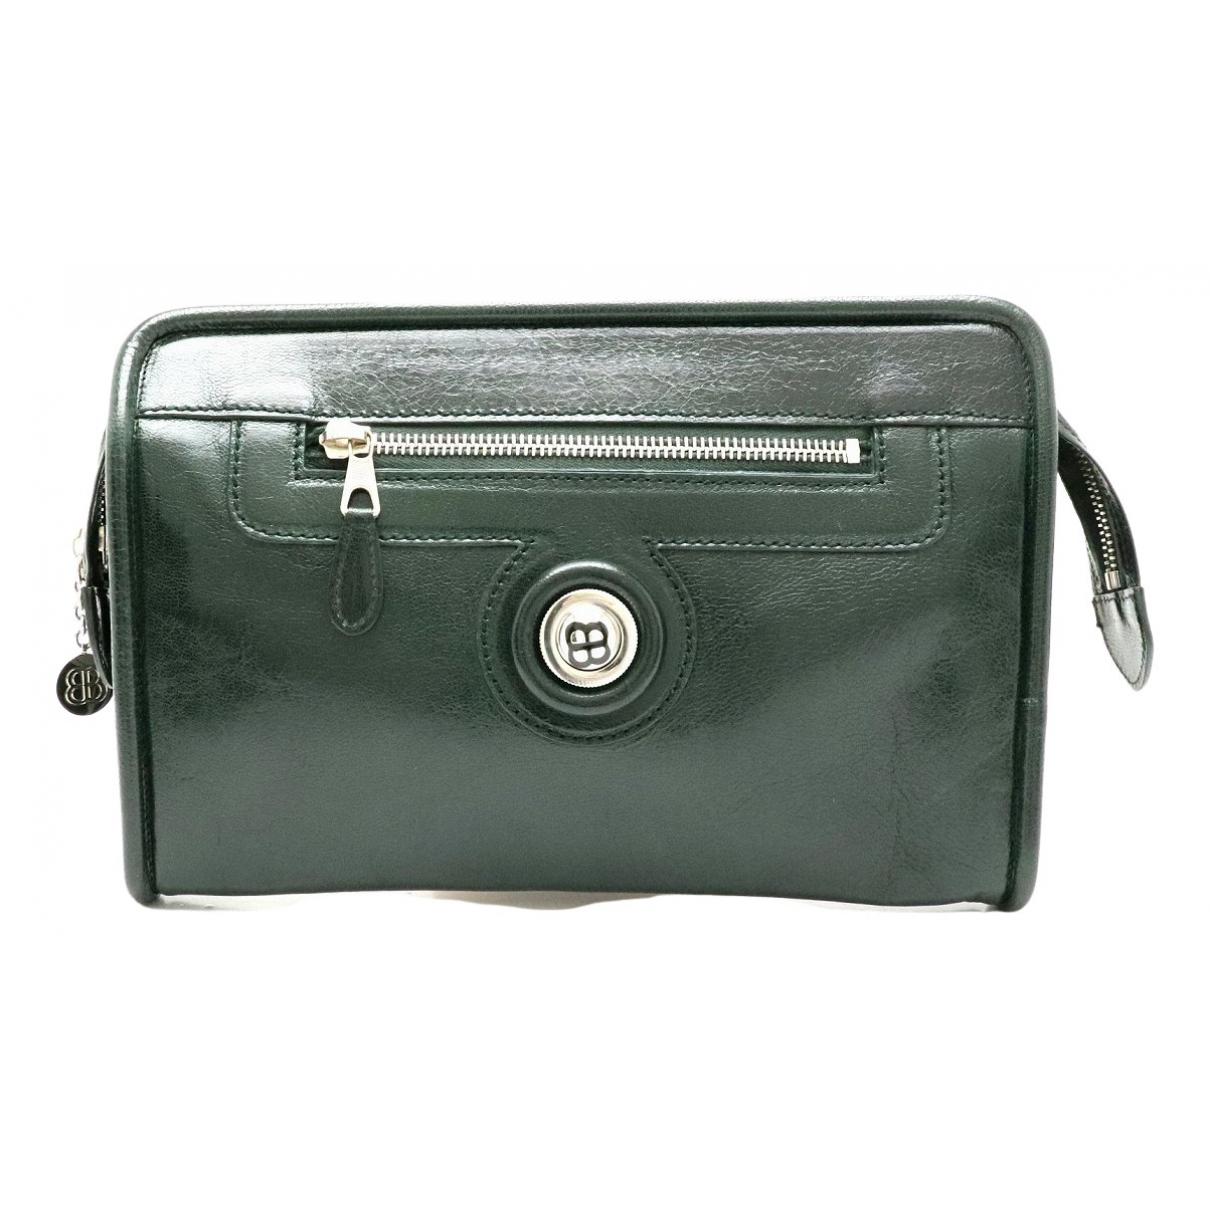 Balenciaga \N Green Leather Clutch bag for Women \N